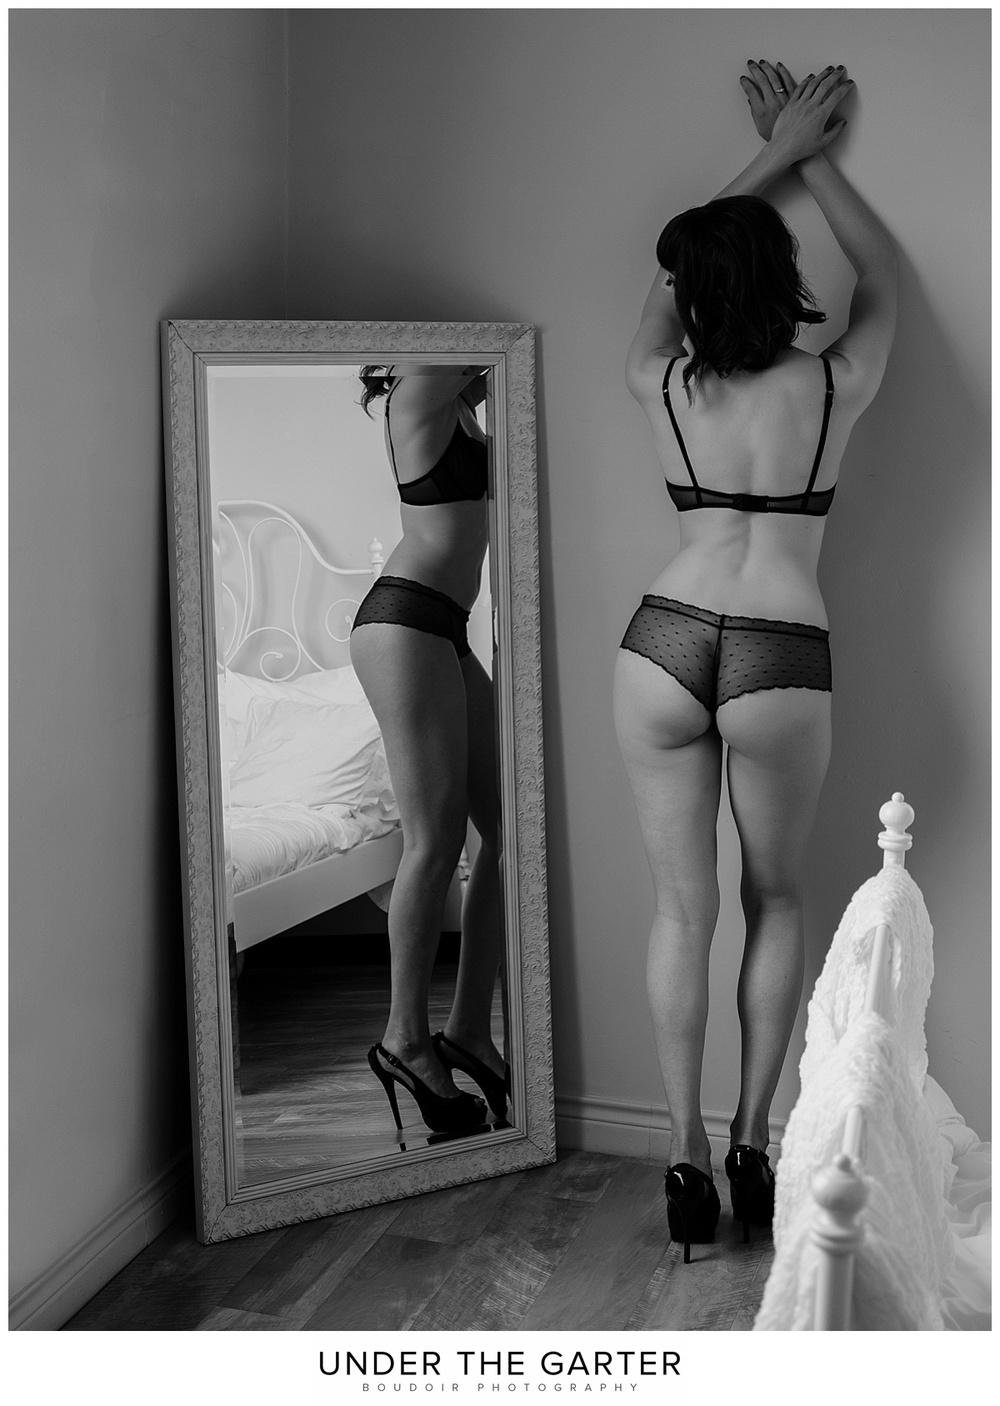 tushie tuesday boudoir photography denver.jpg